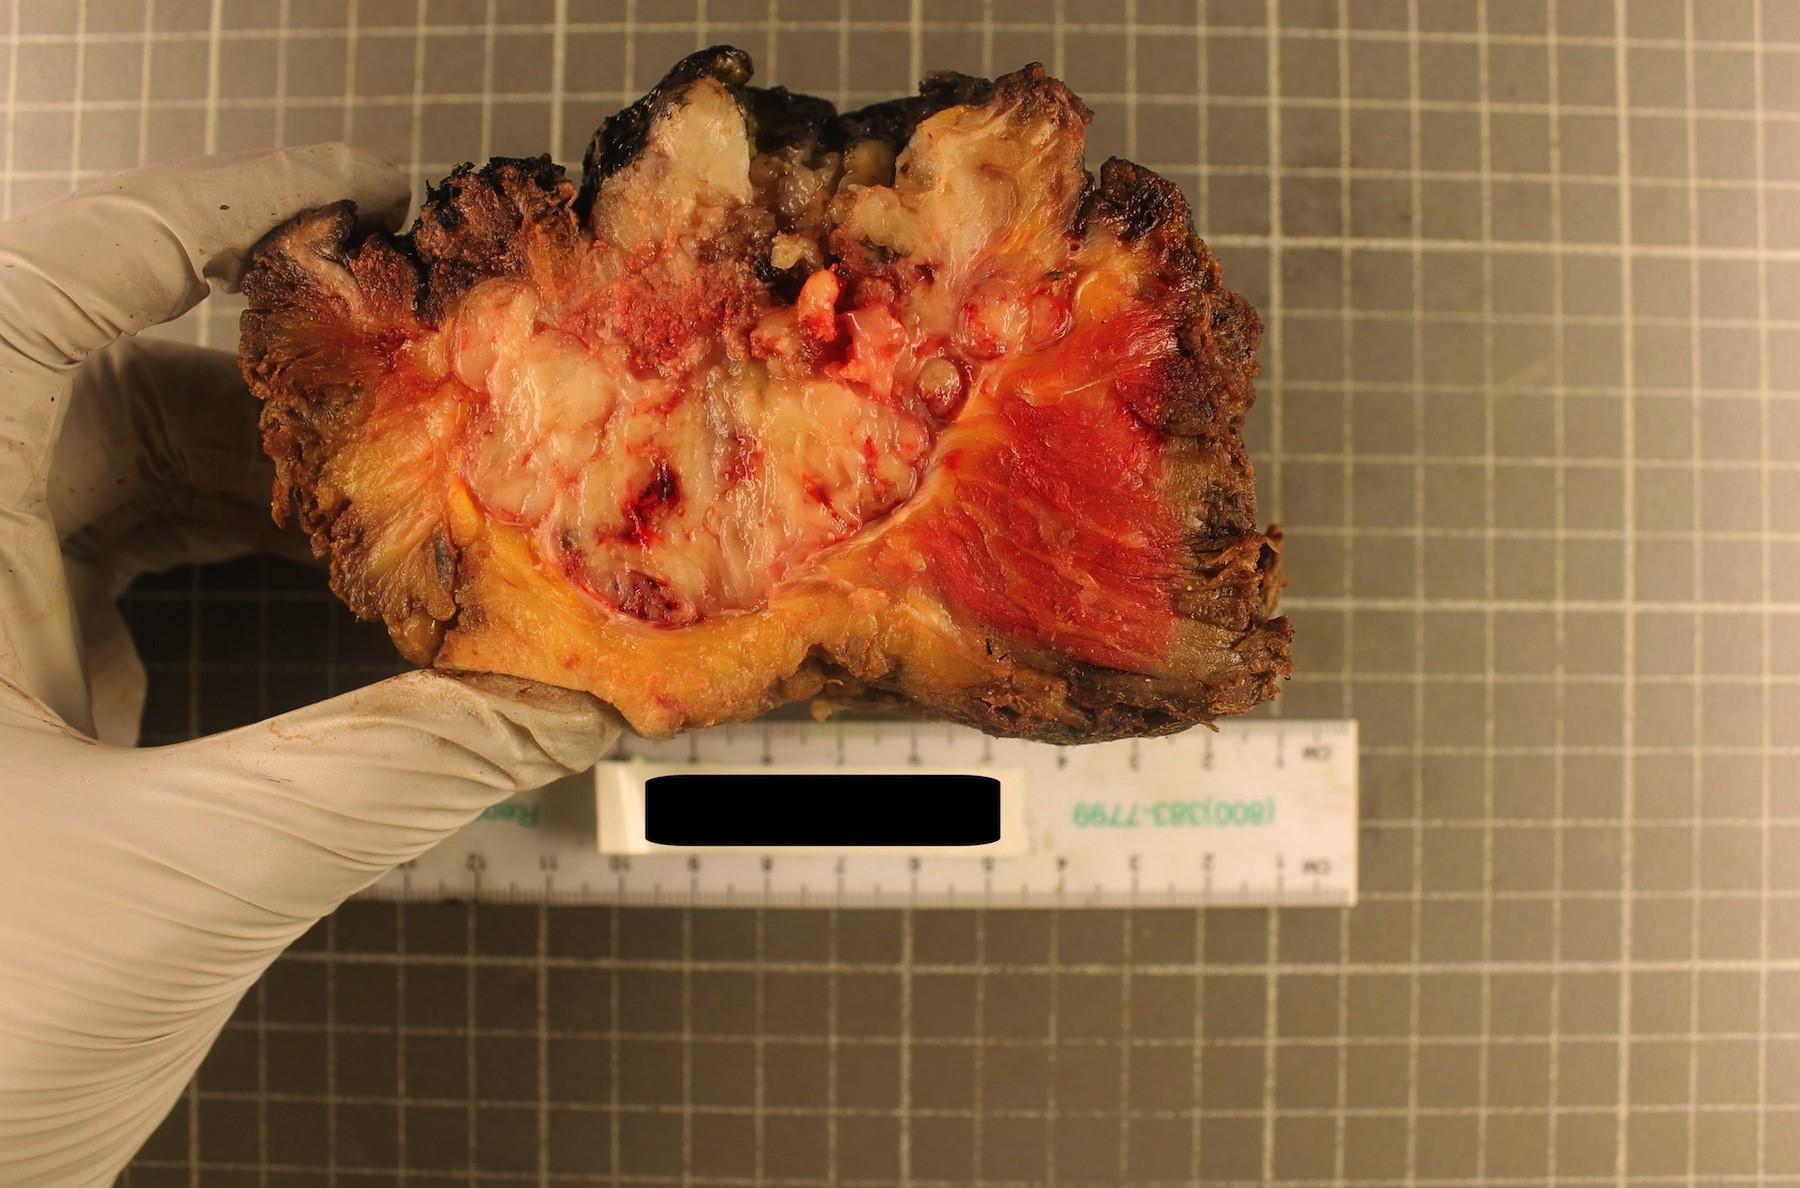 Chordoma has fleshy cut surface